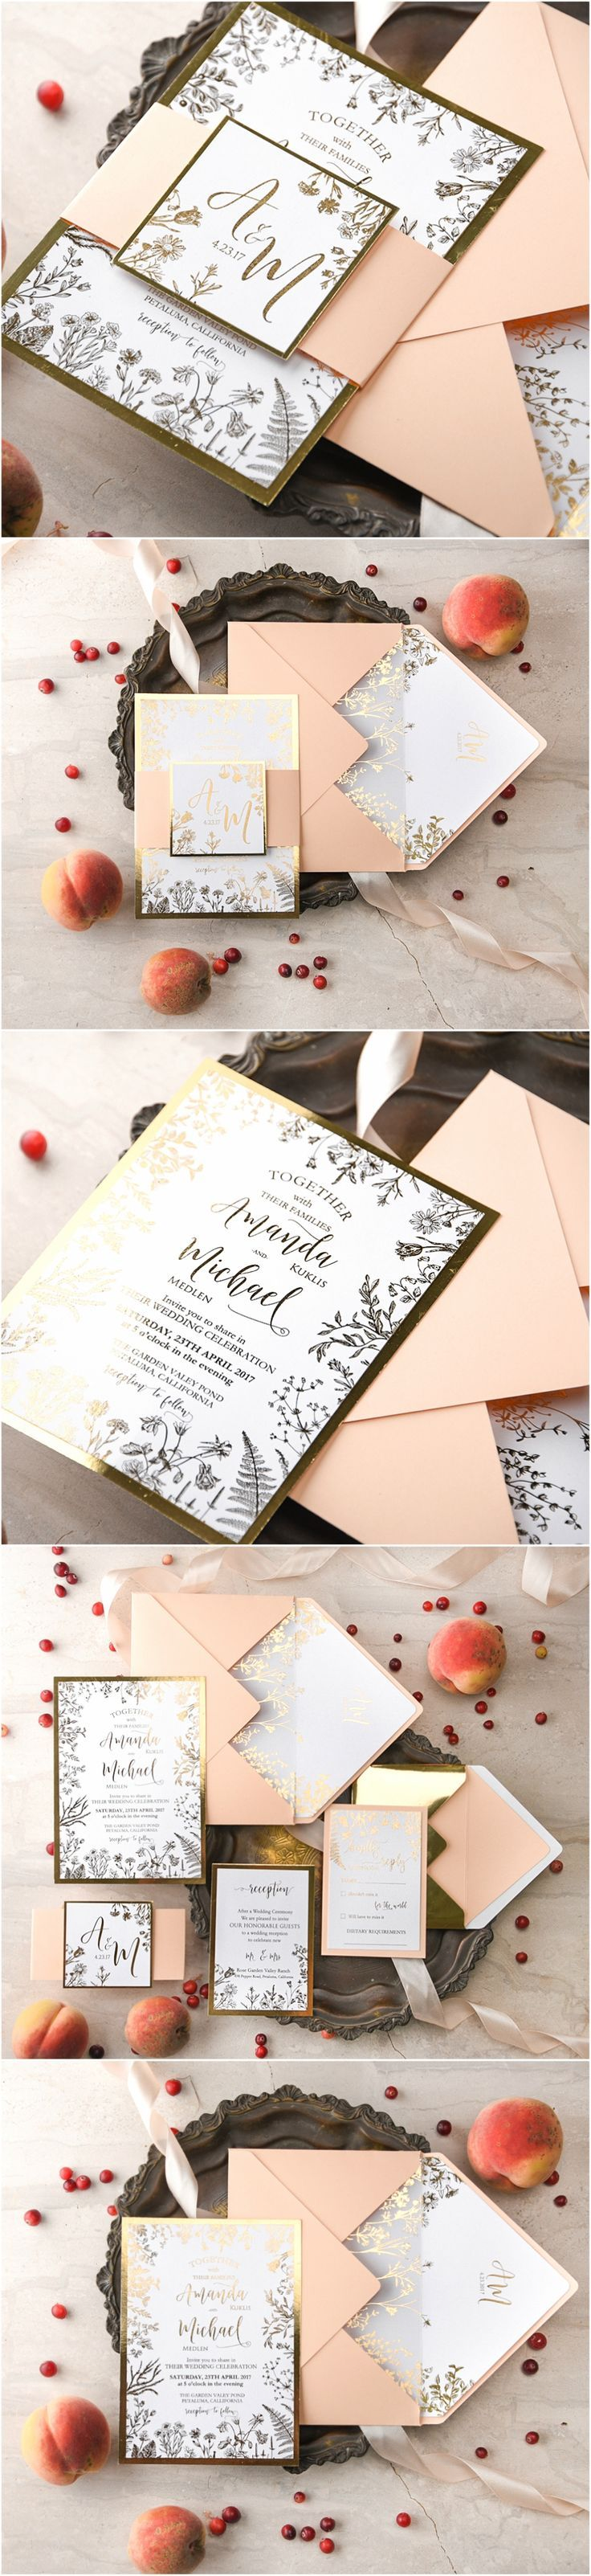 Peach & Gold Wedding Invitations #gold #peach #weddinginvitations #goldfoil #glitter #elegat #glamorous